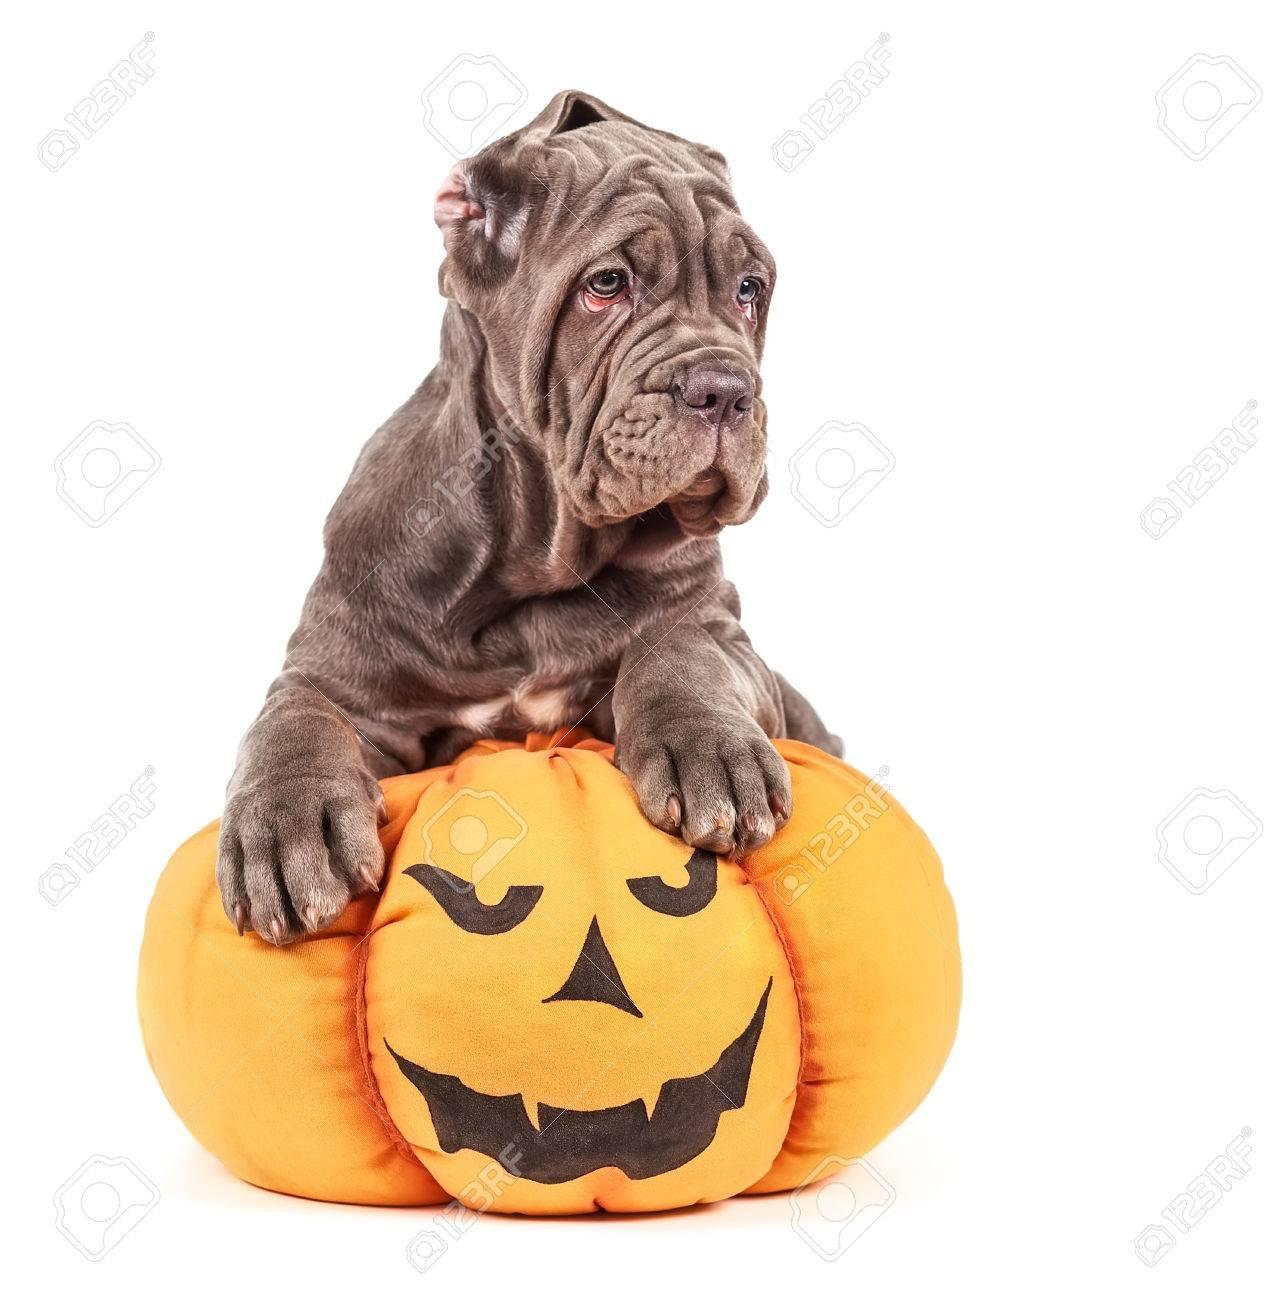 italian mastiff cane corso with toy pumpkin to halloween on white background stock photo 66036680